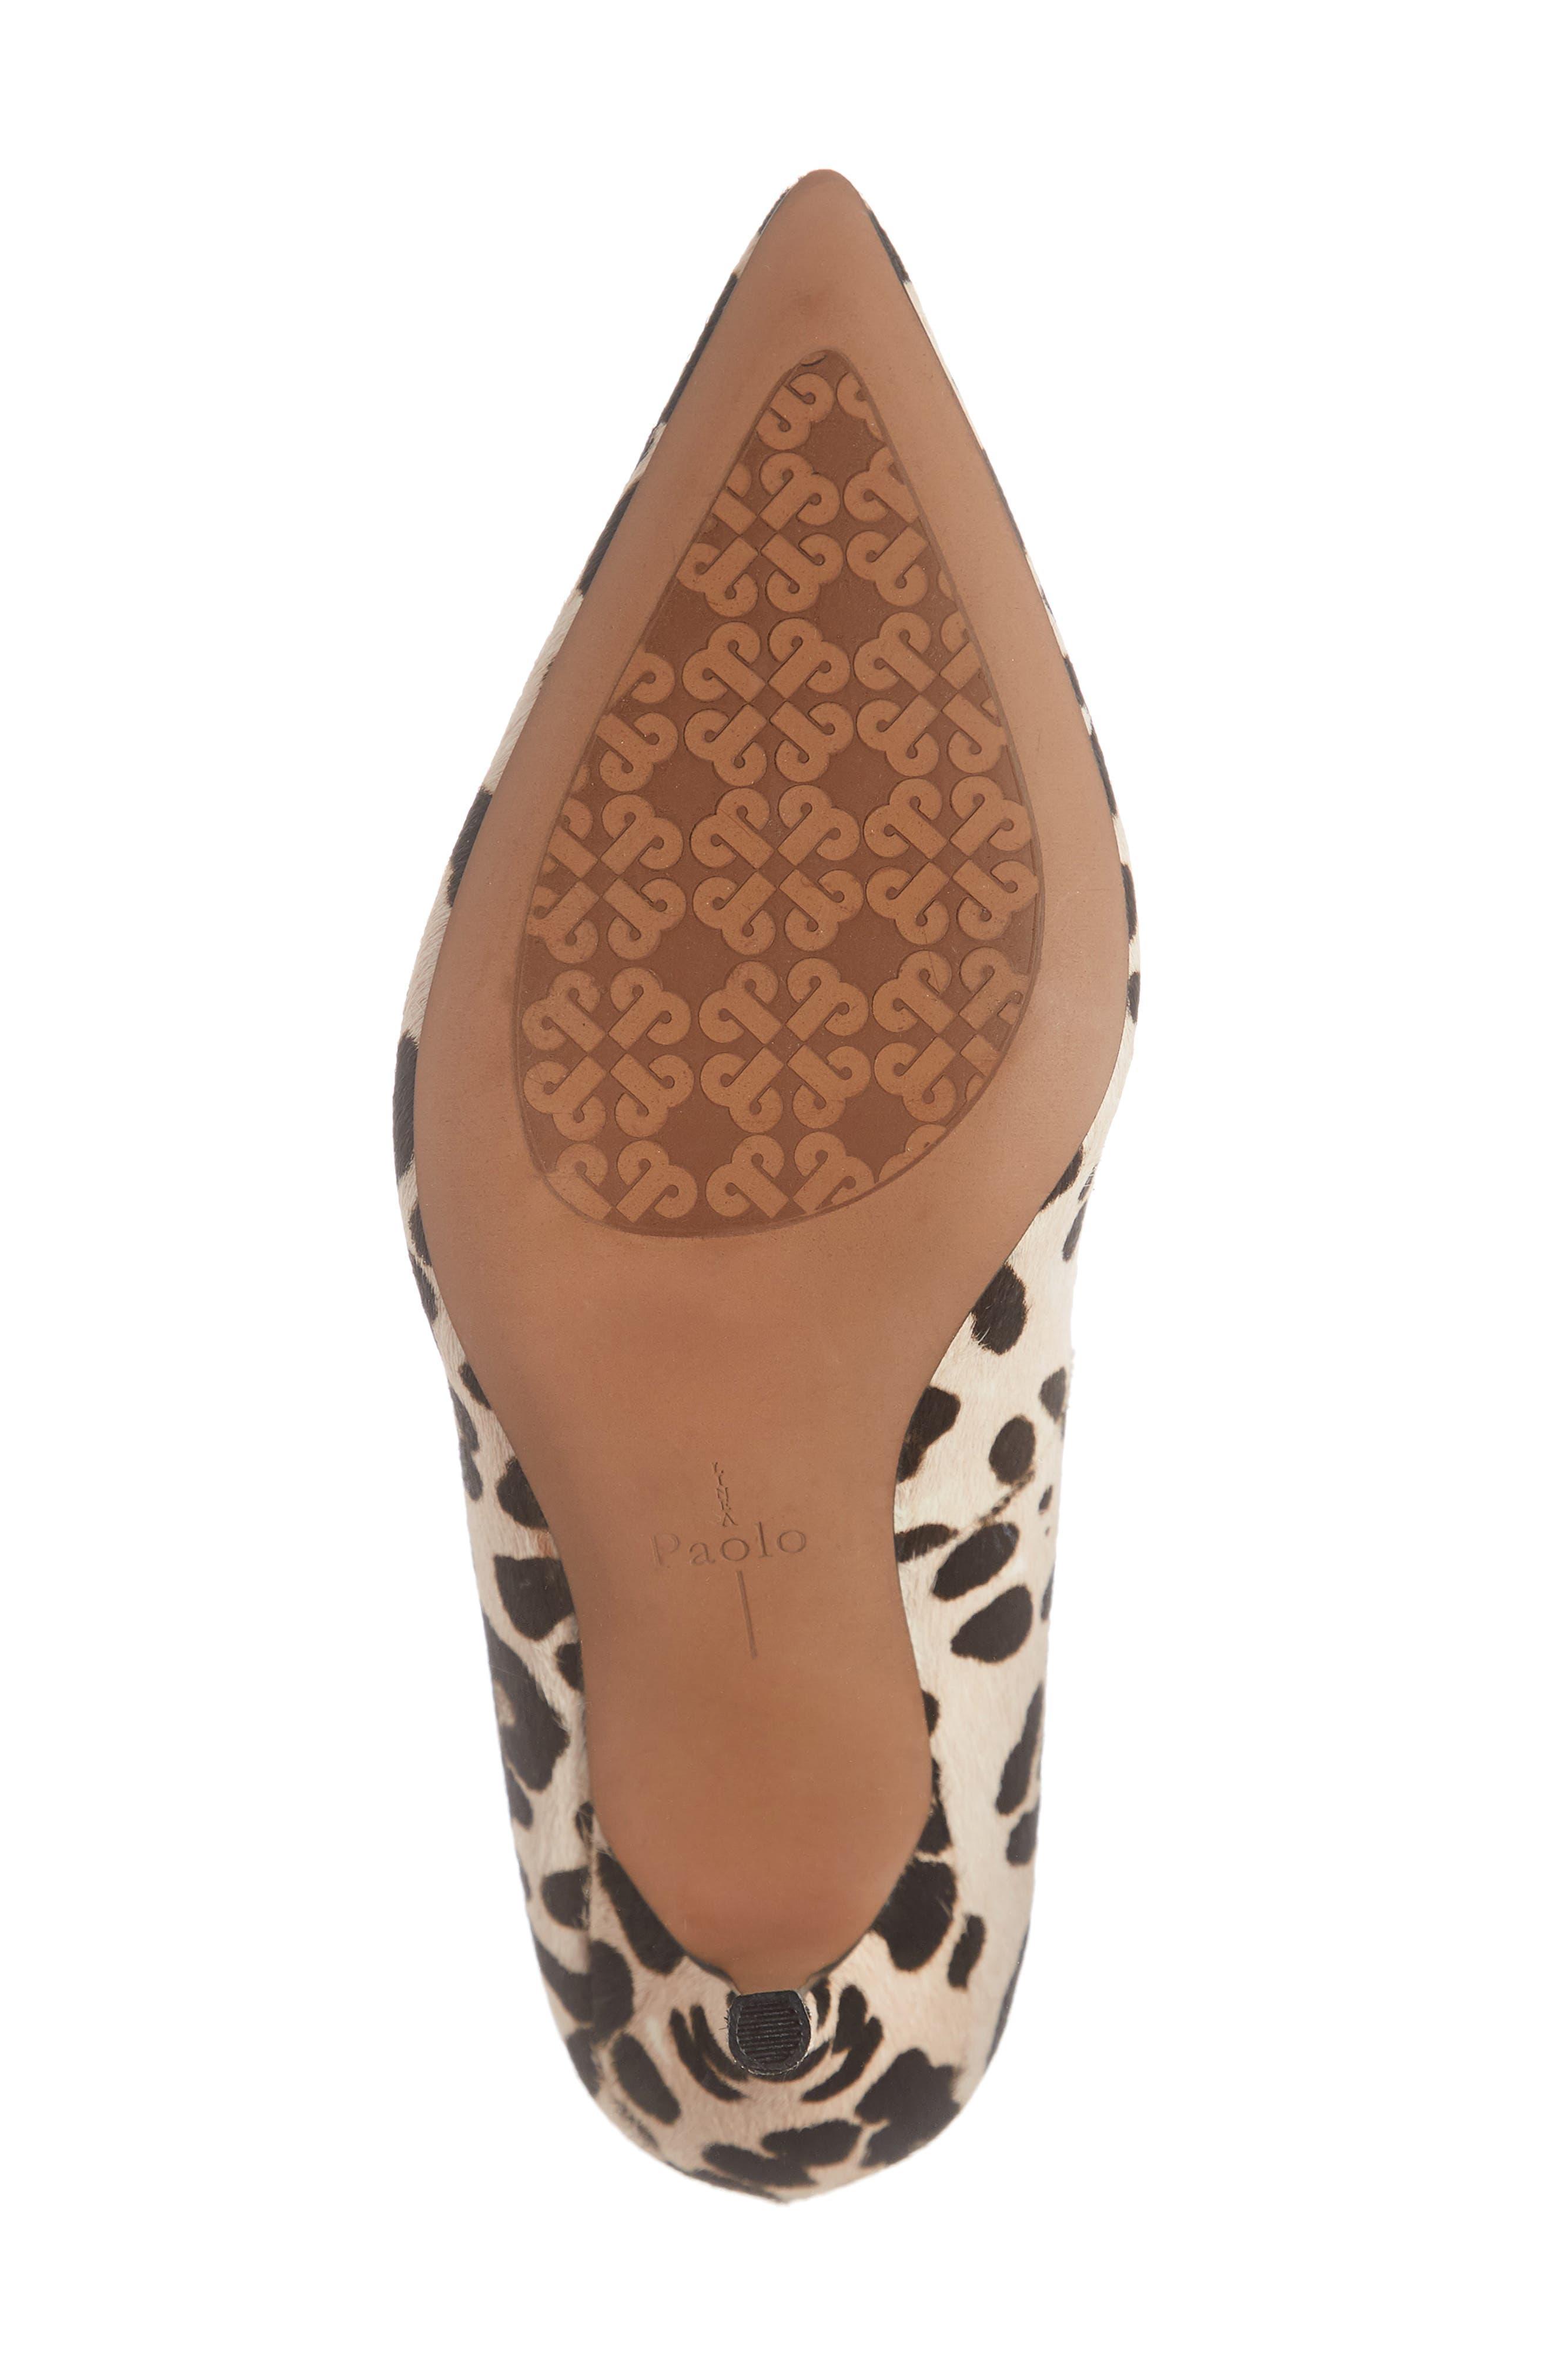 LINEA PAOLO, Payton Genuine Calf Hair Pointy Toe Pump, Alternate thumbnail 6, color, WHITE/ BLACK CALF HAIR